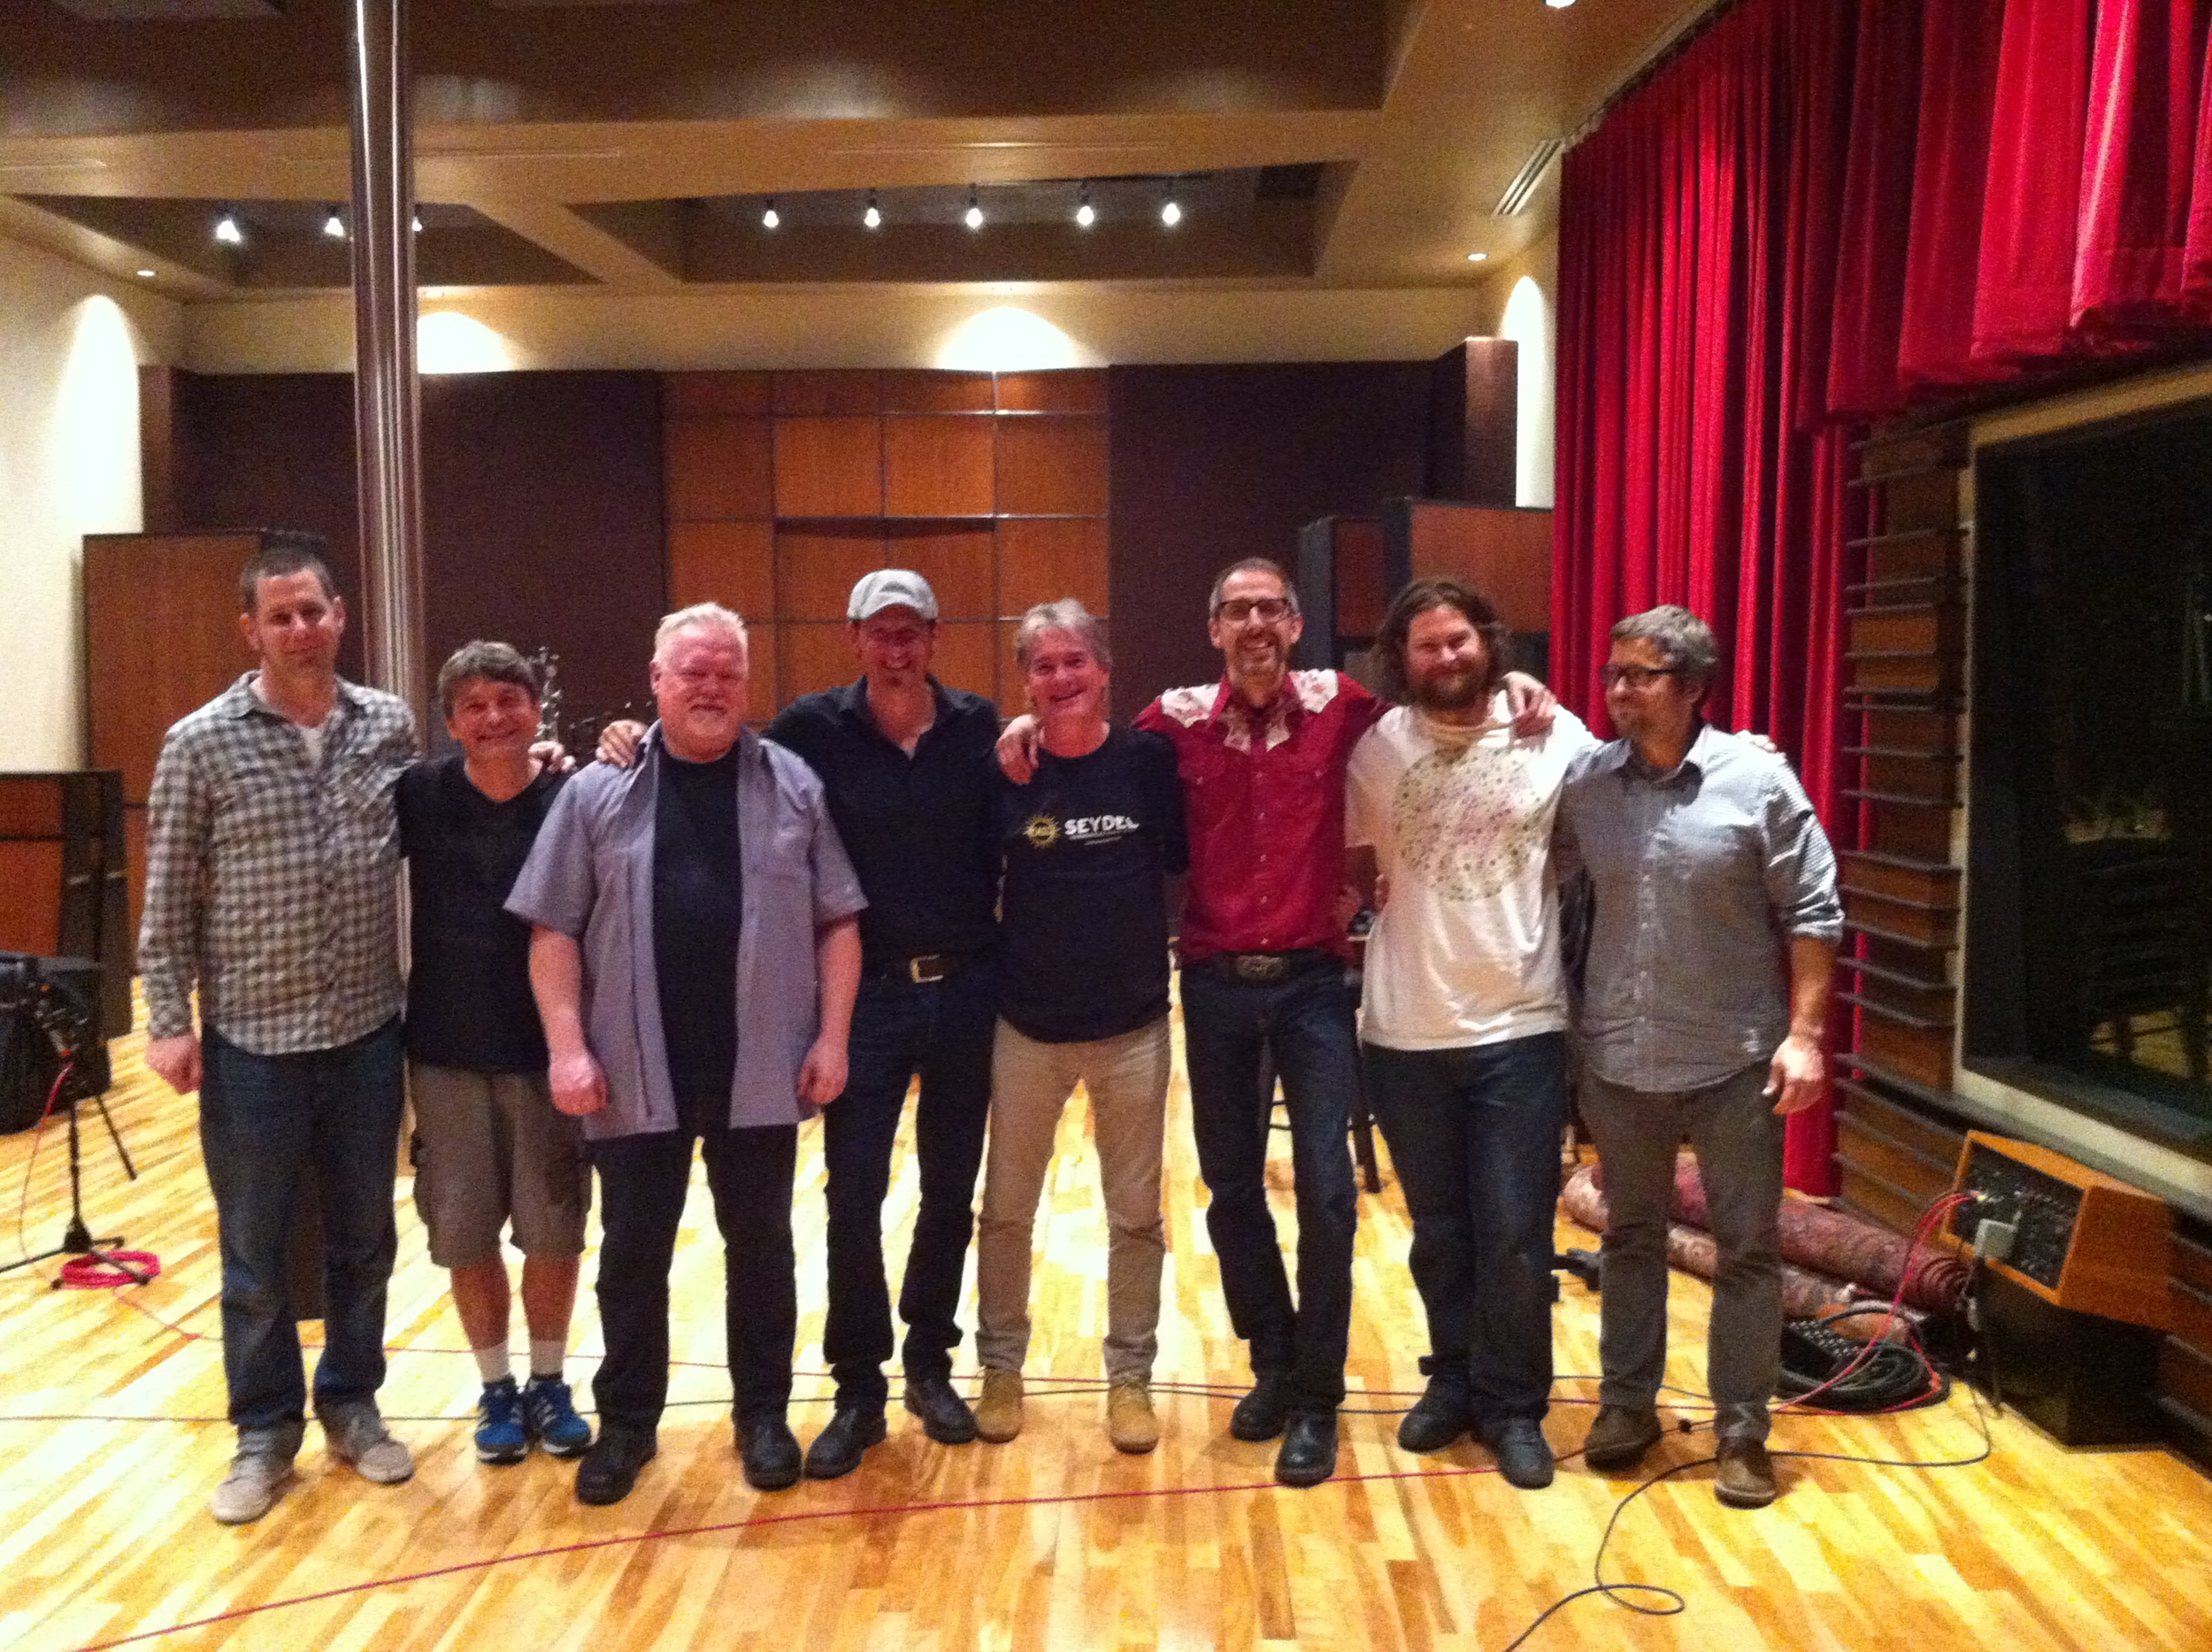 Guy Bélanger sessions @ Revolution Recording w/ Adam Warner, René Moisan, AlecFraser, Steve Strongman, Guy Bélanger, Myself, Stephen Koszler & Tim Abraham